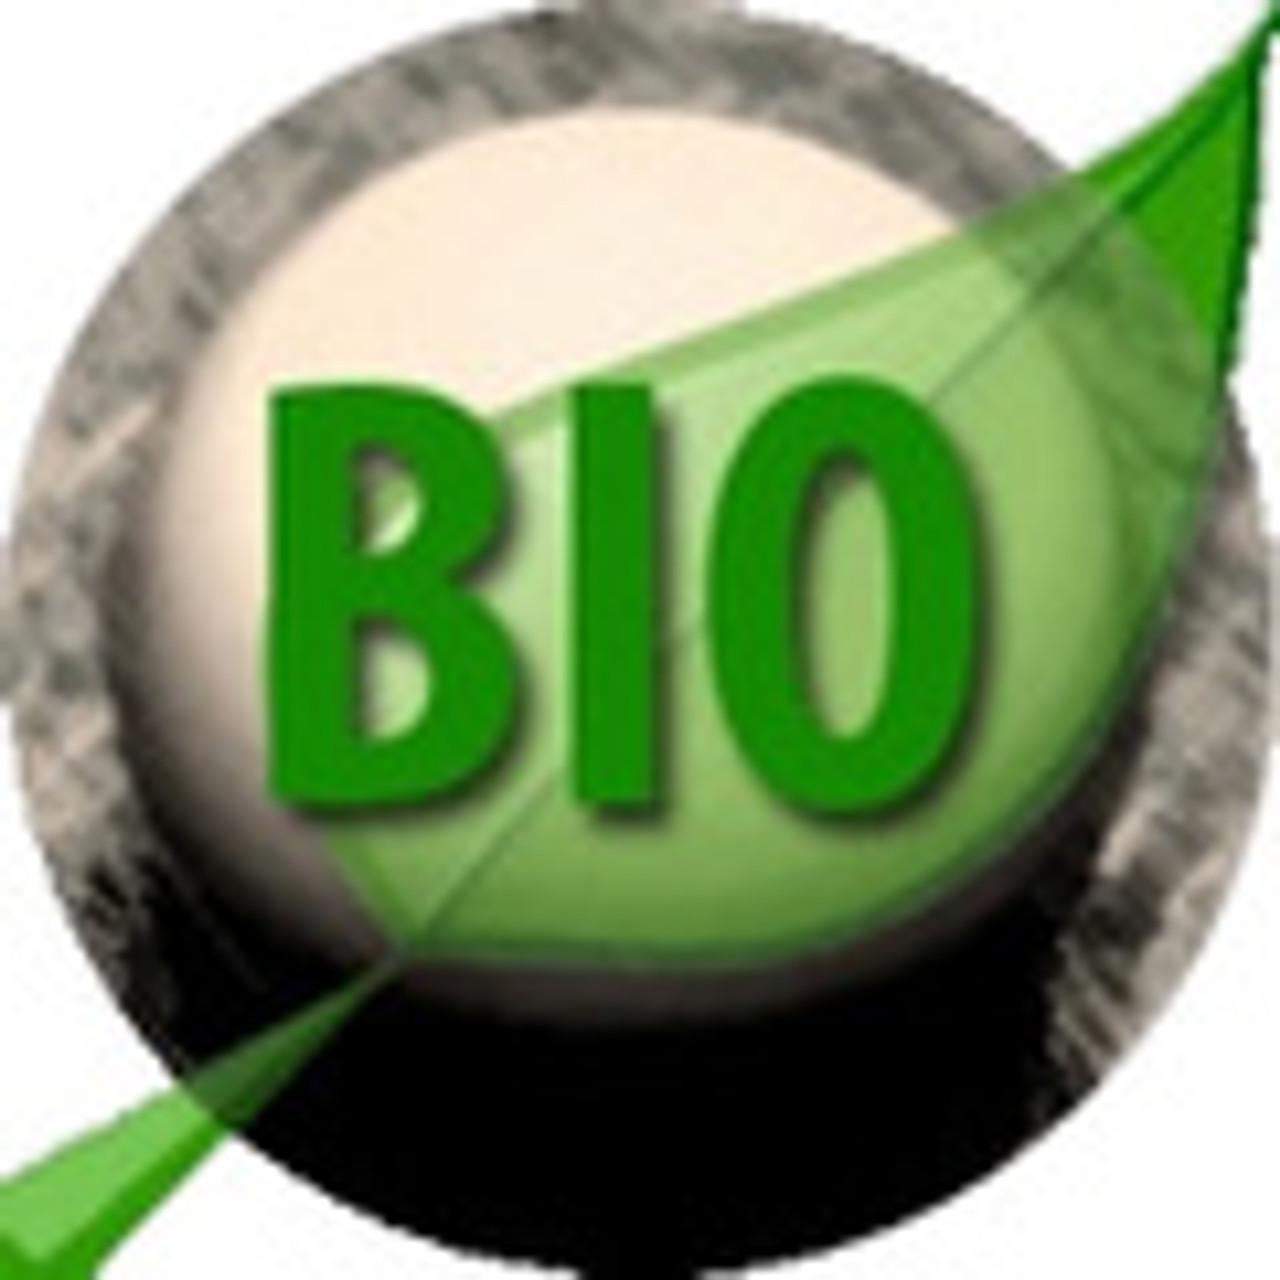 Biodegradable BBs